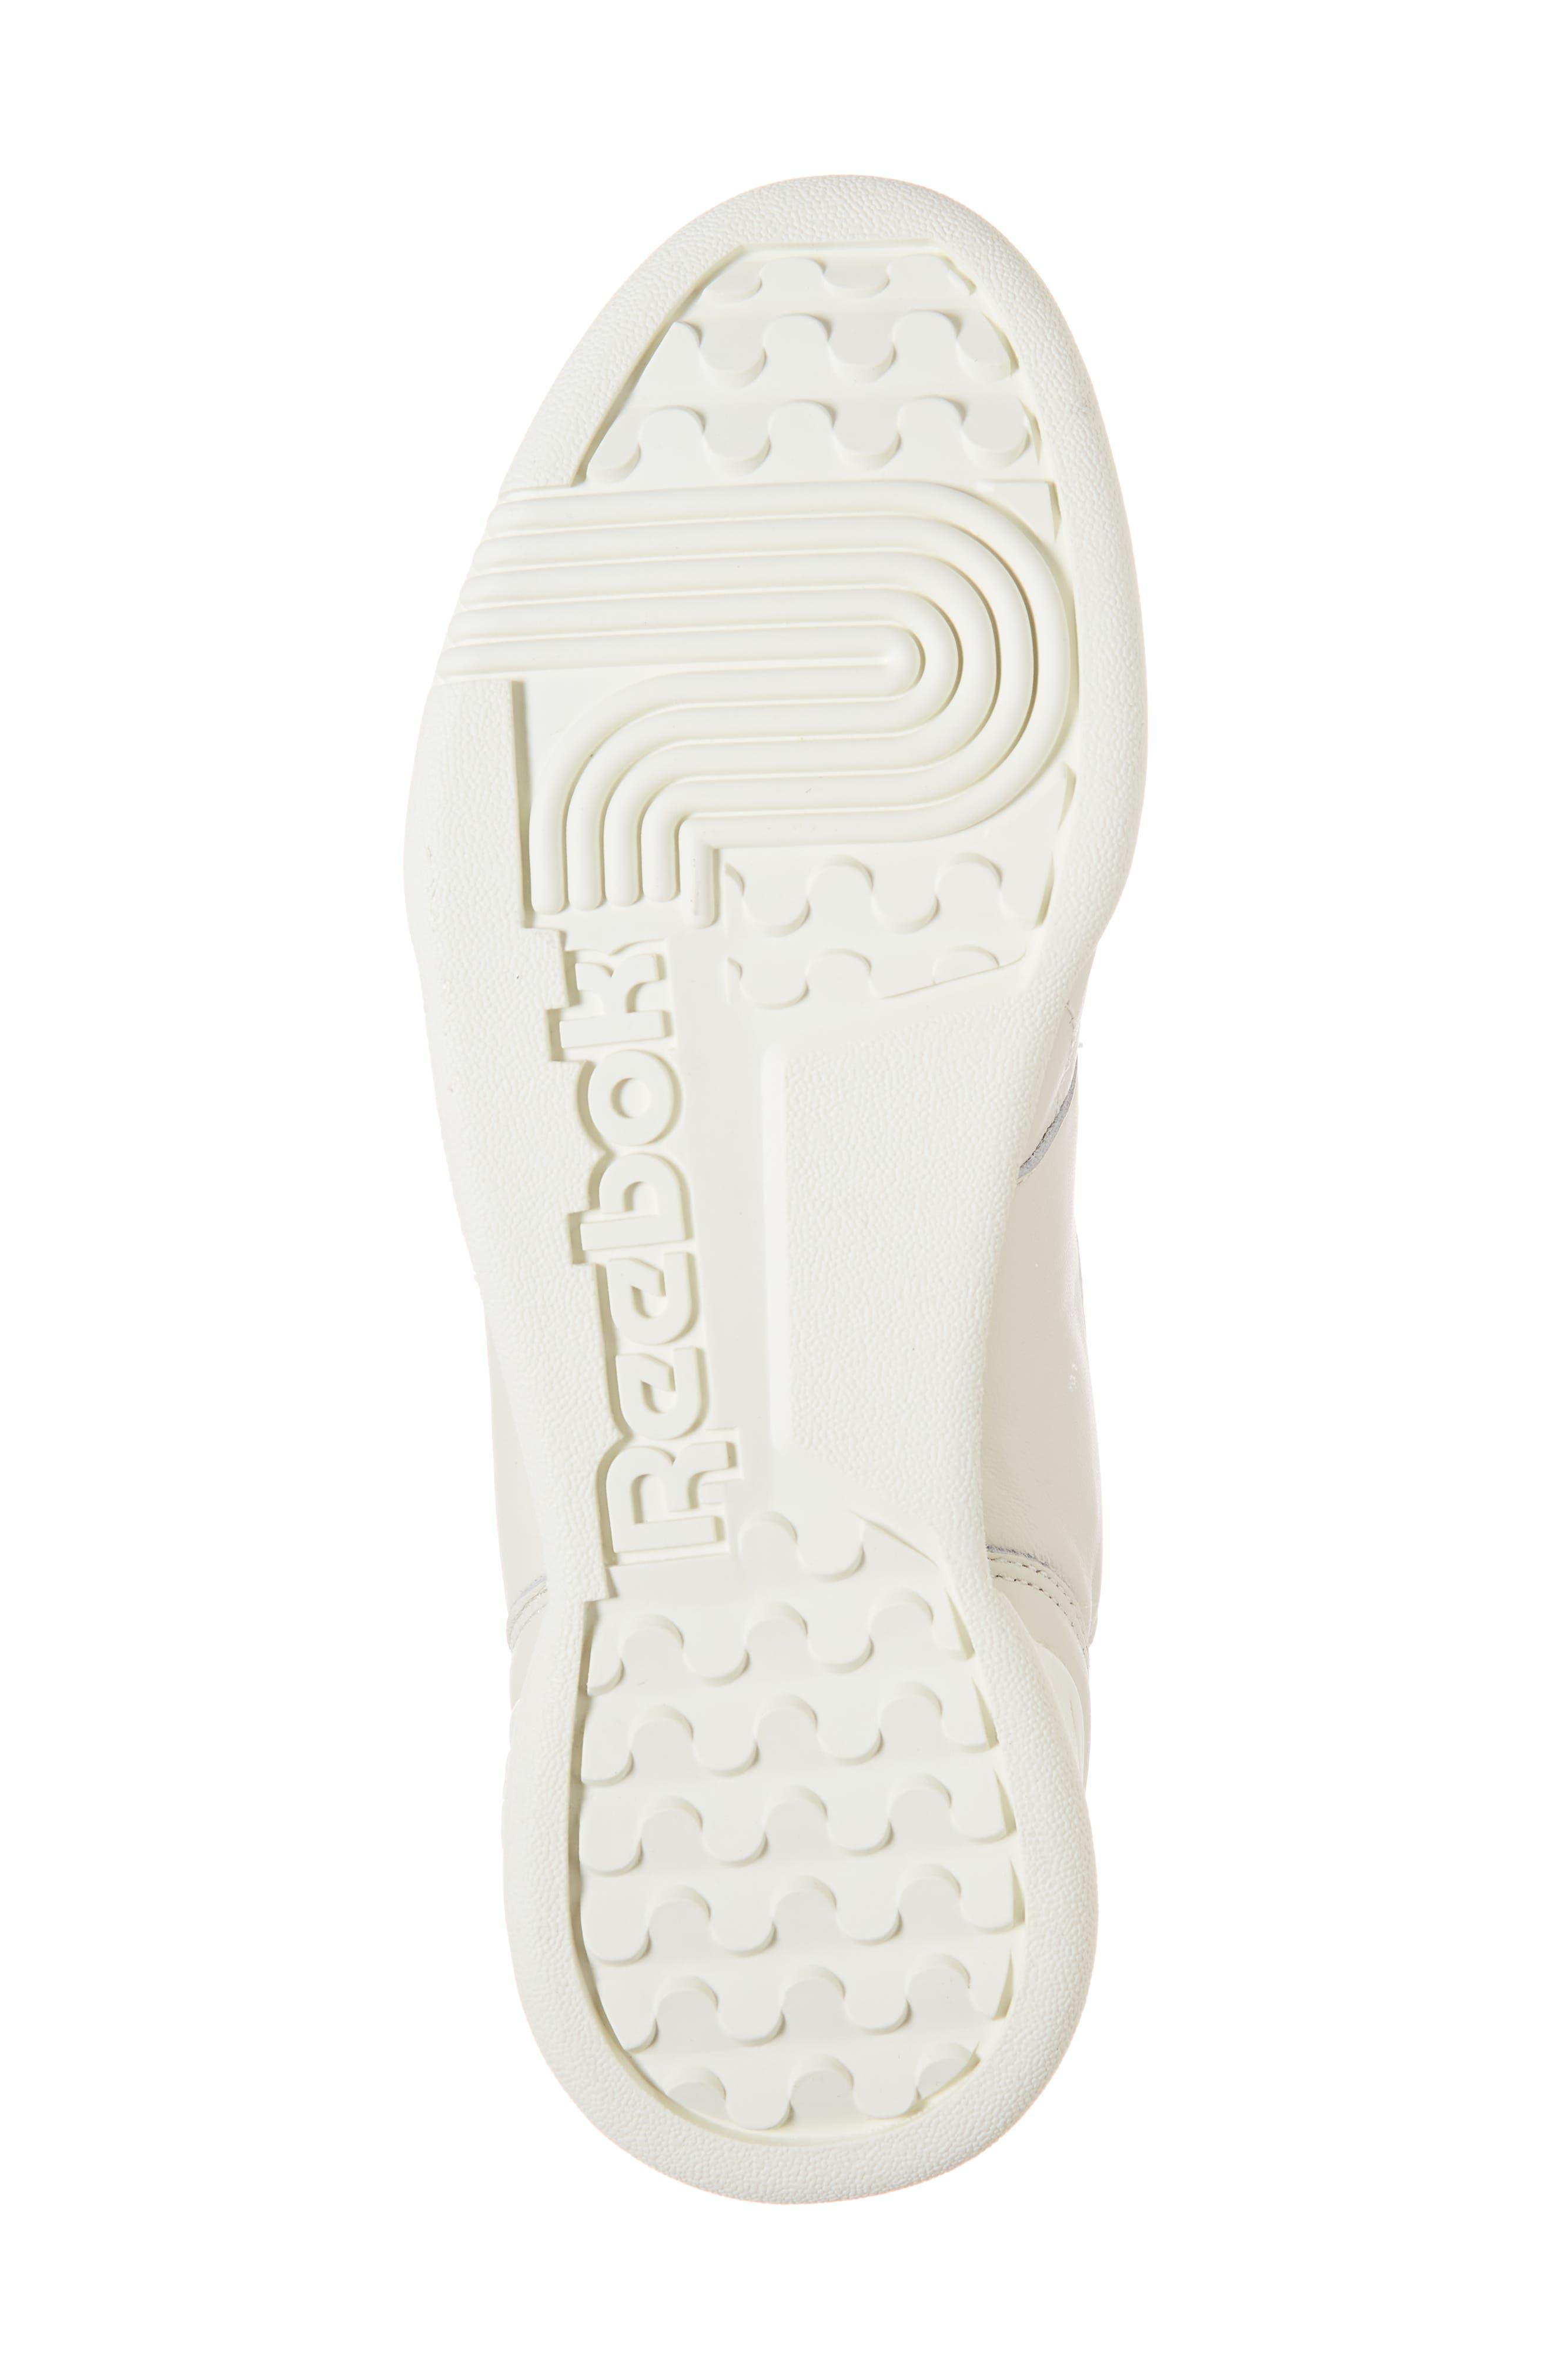 Workout Low Plus Sneaker,                             Alternate thumbnail 6, color,                             WHITE/ PRACTICAL PINK